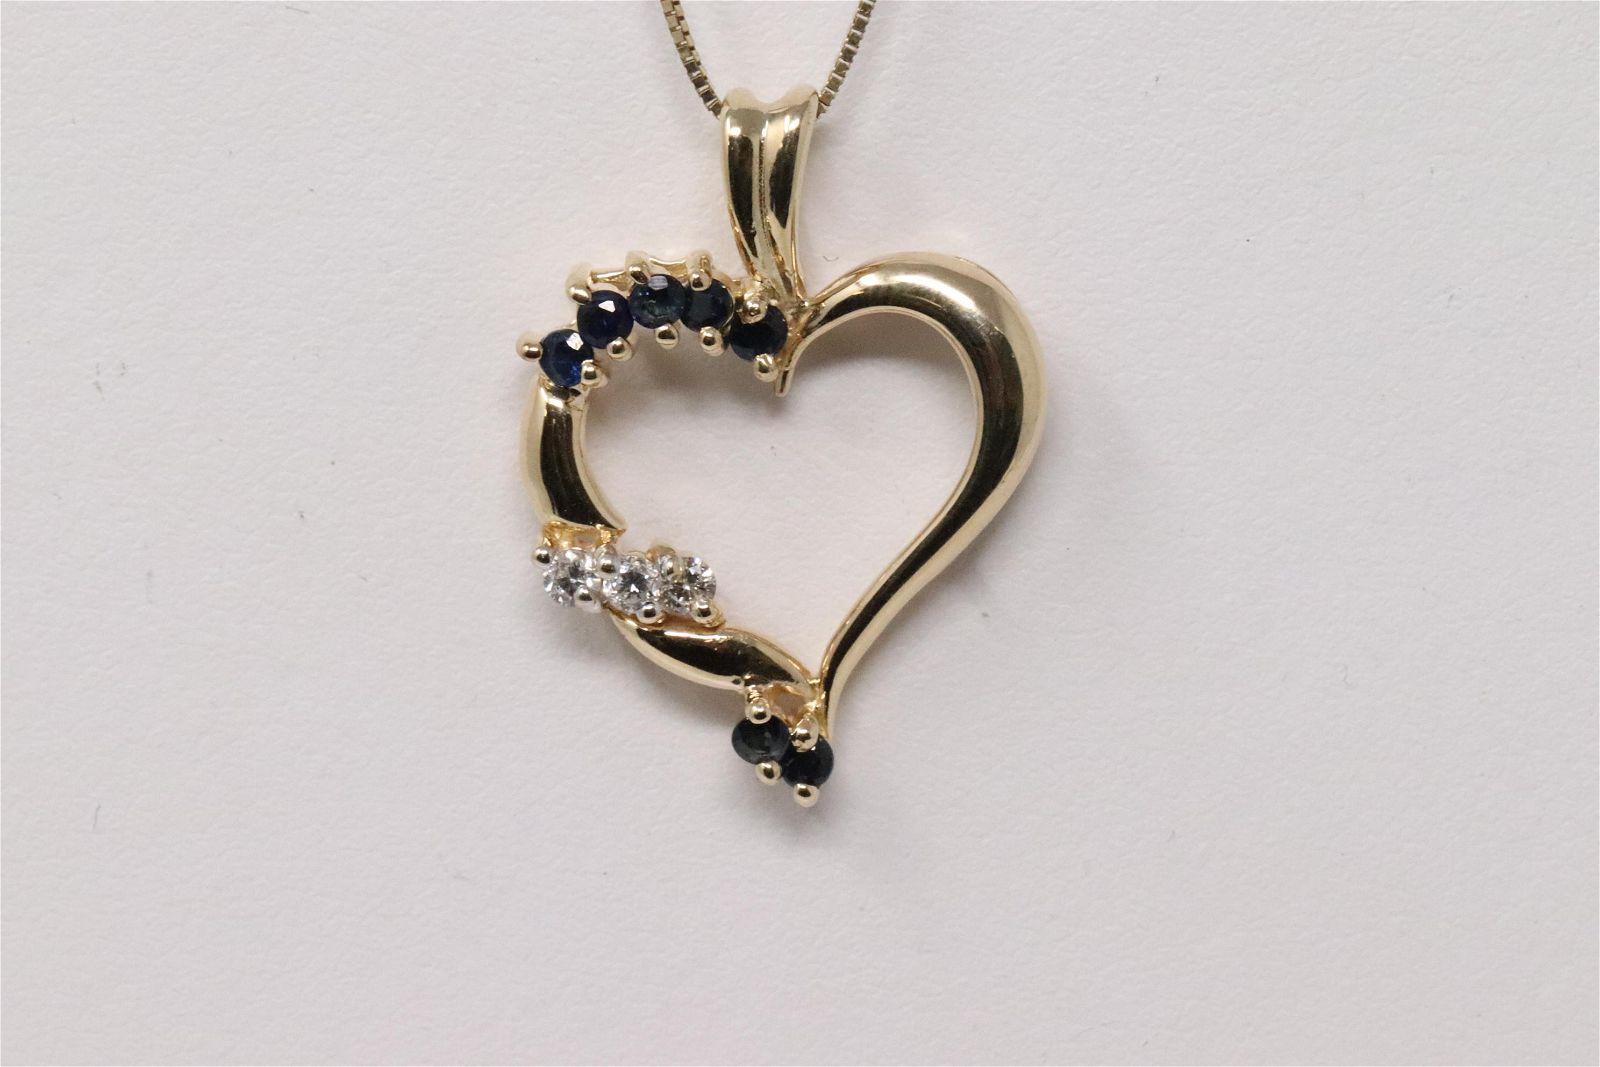 14KT Diamond/Sapphire Heart Pendant